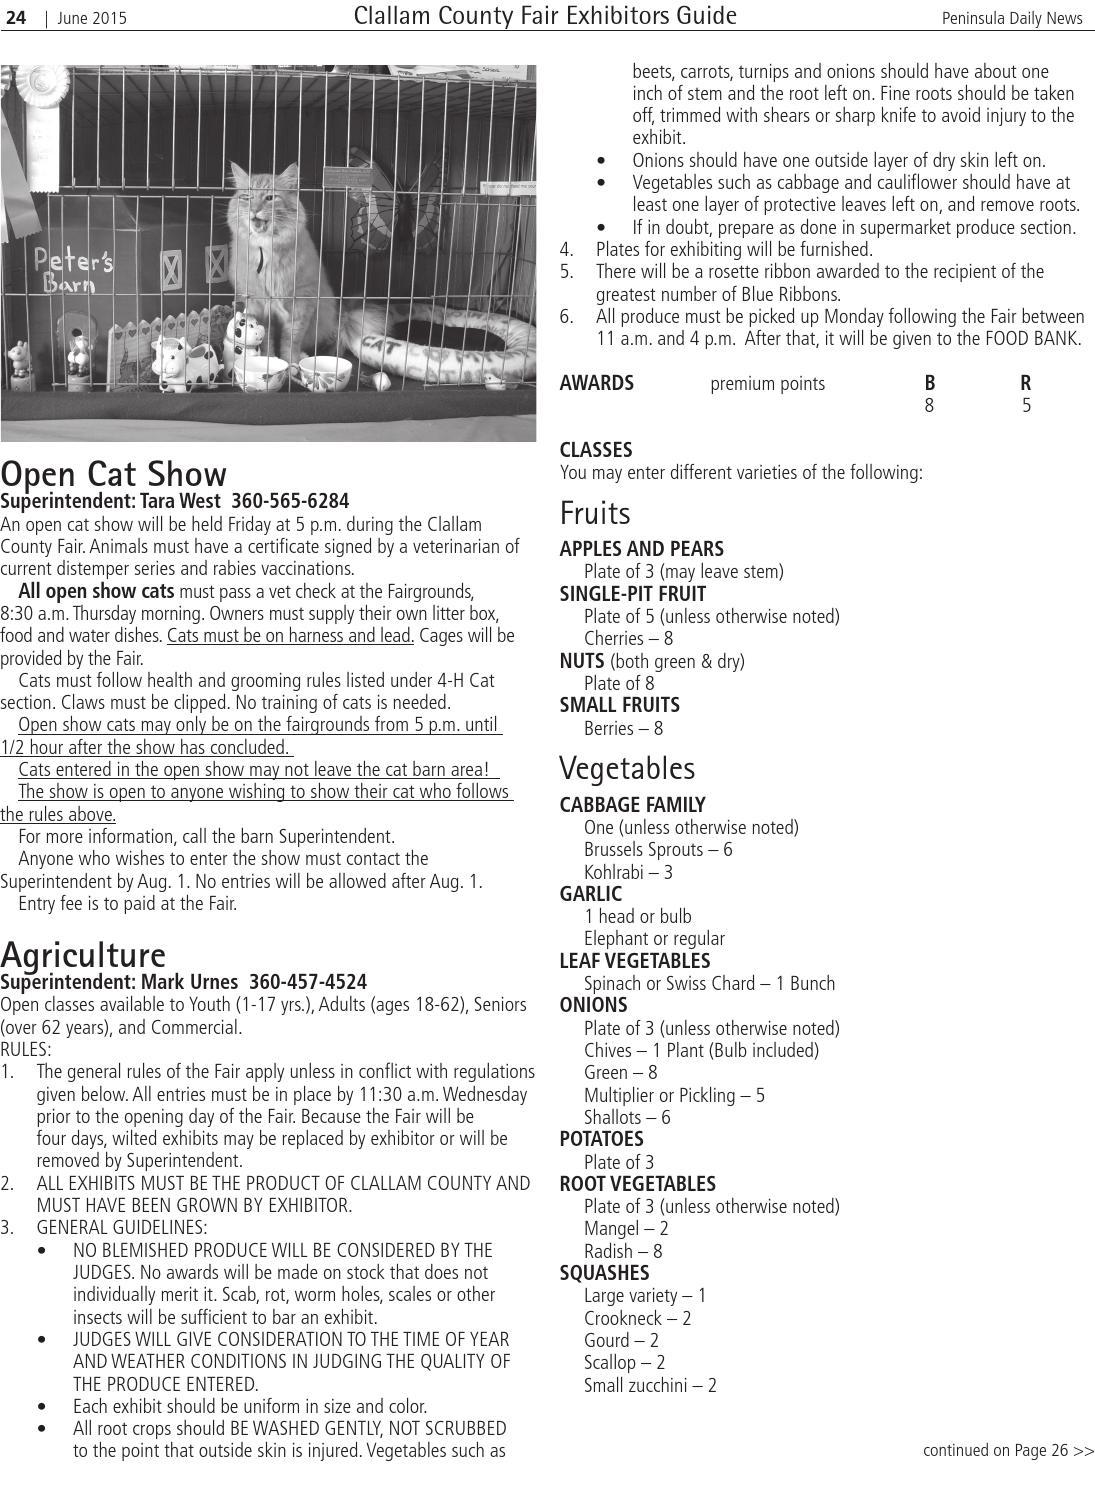 Clallam County Fair Exhibitor S Guide 2015 By Peninsula